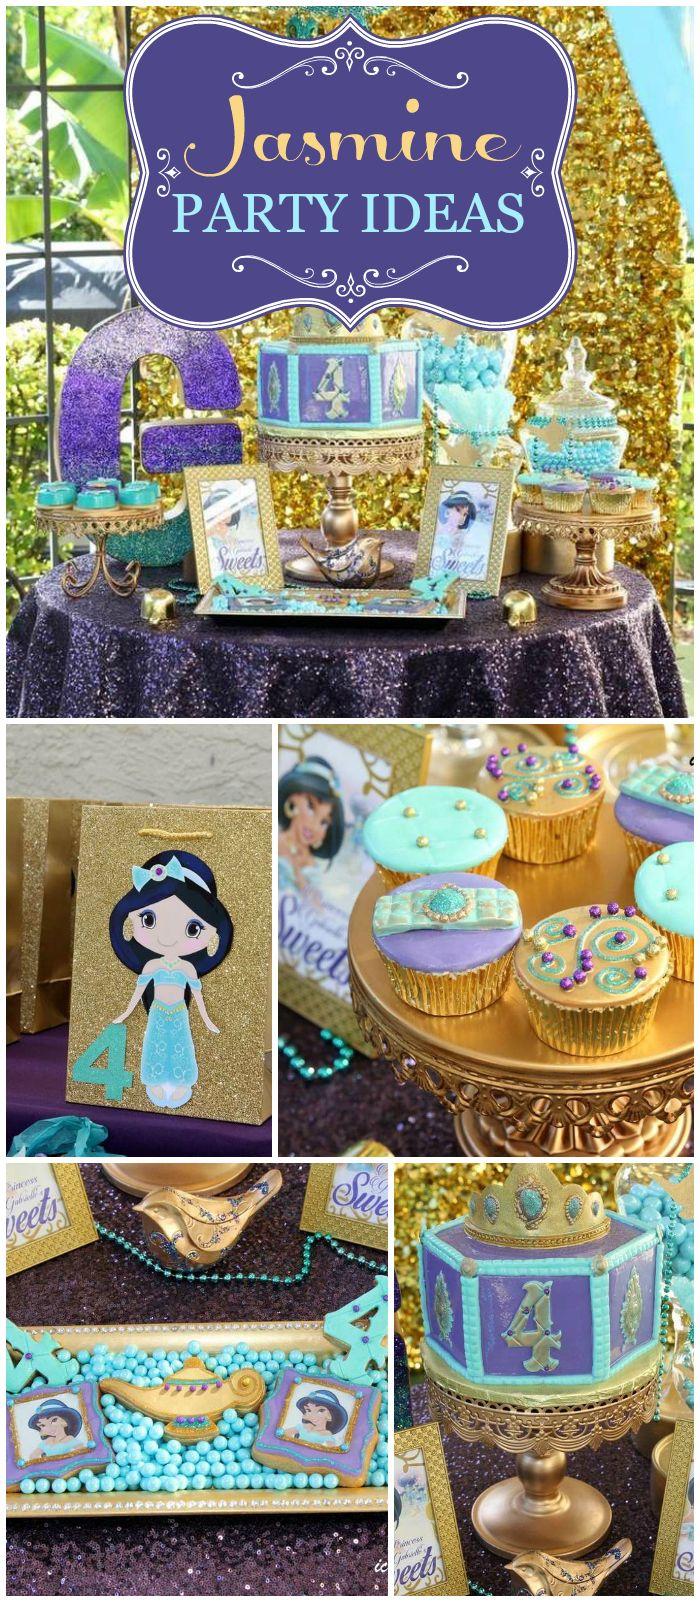 Princess Jasmine Birthday Party Decorations  from i.pinimg.com